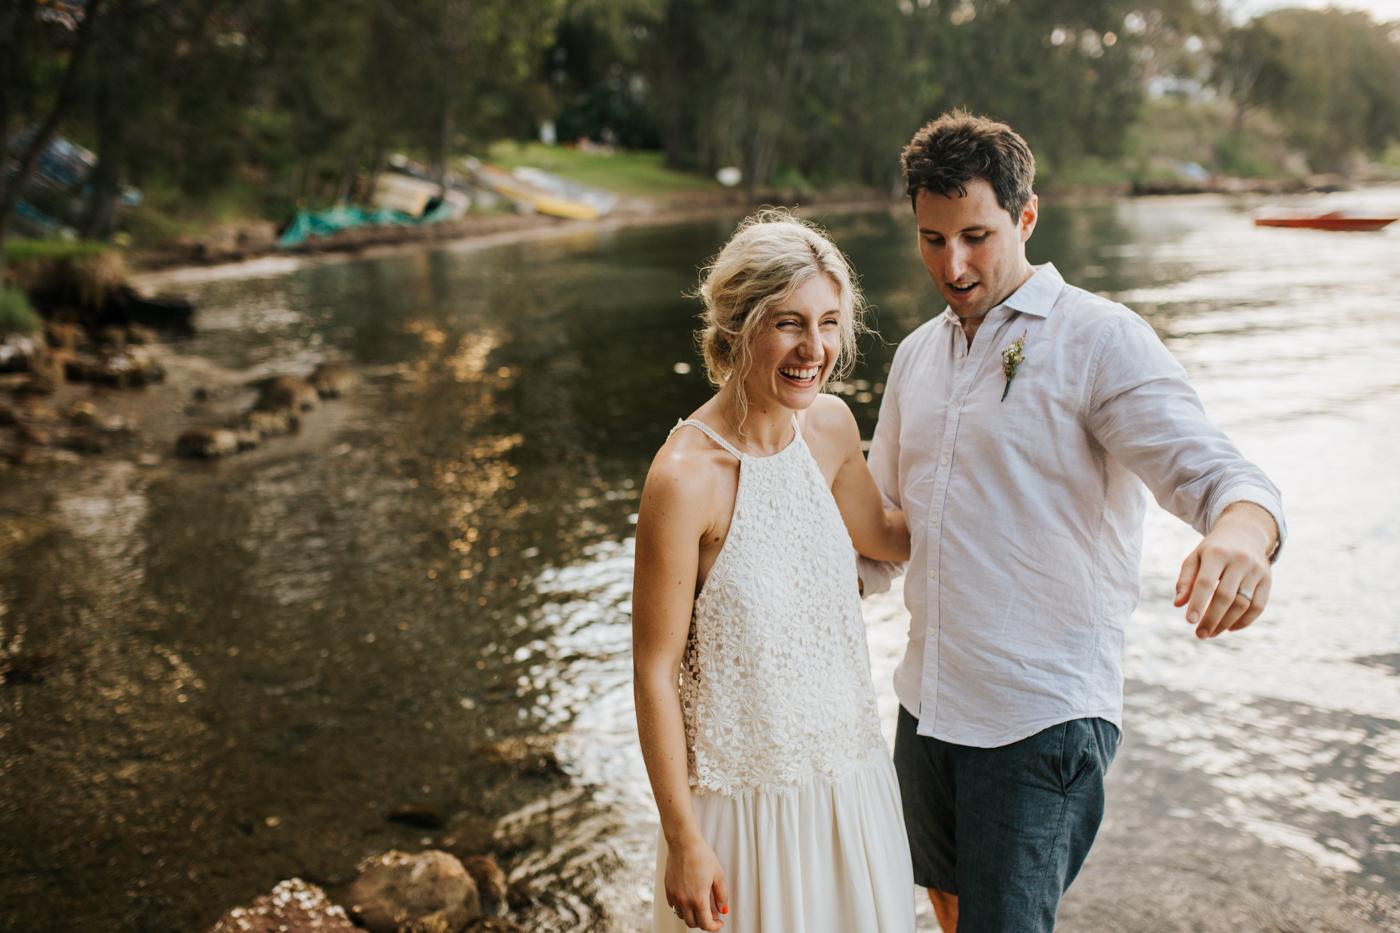 Emma & Ben - Lake Macquarie - Hunter Valley Wedding - Samantha Heather Photography-211.jpg